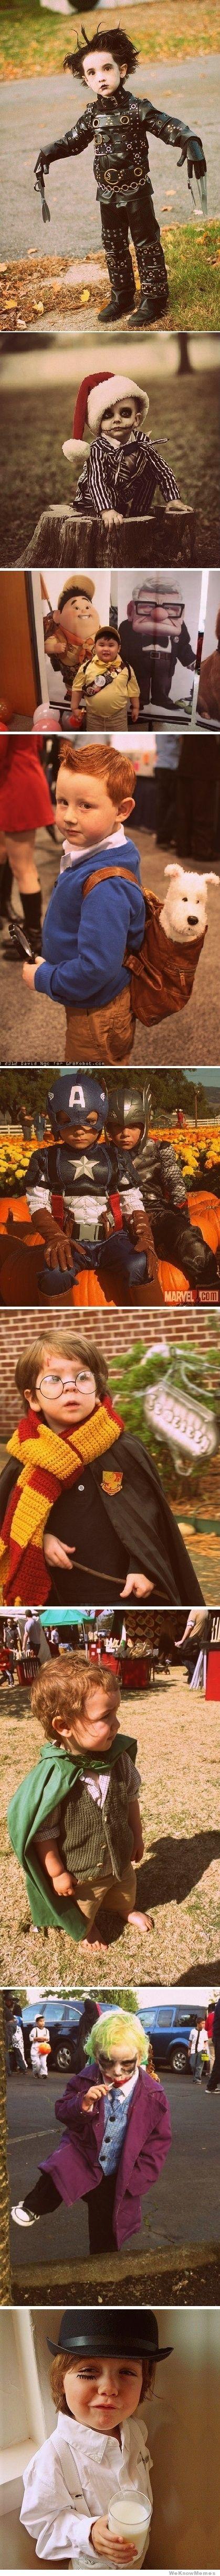 Kid movie costumes. So cute!